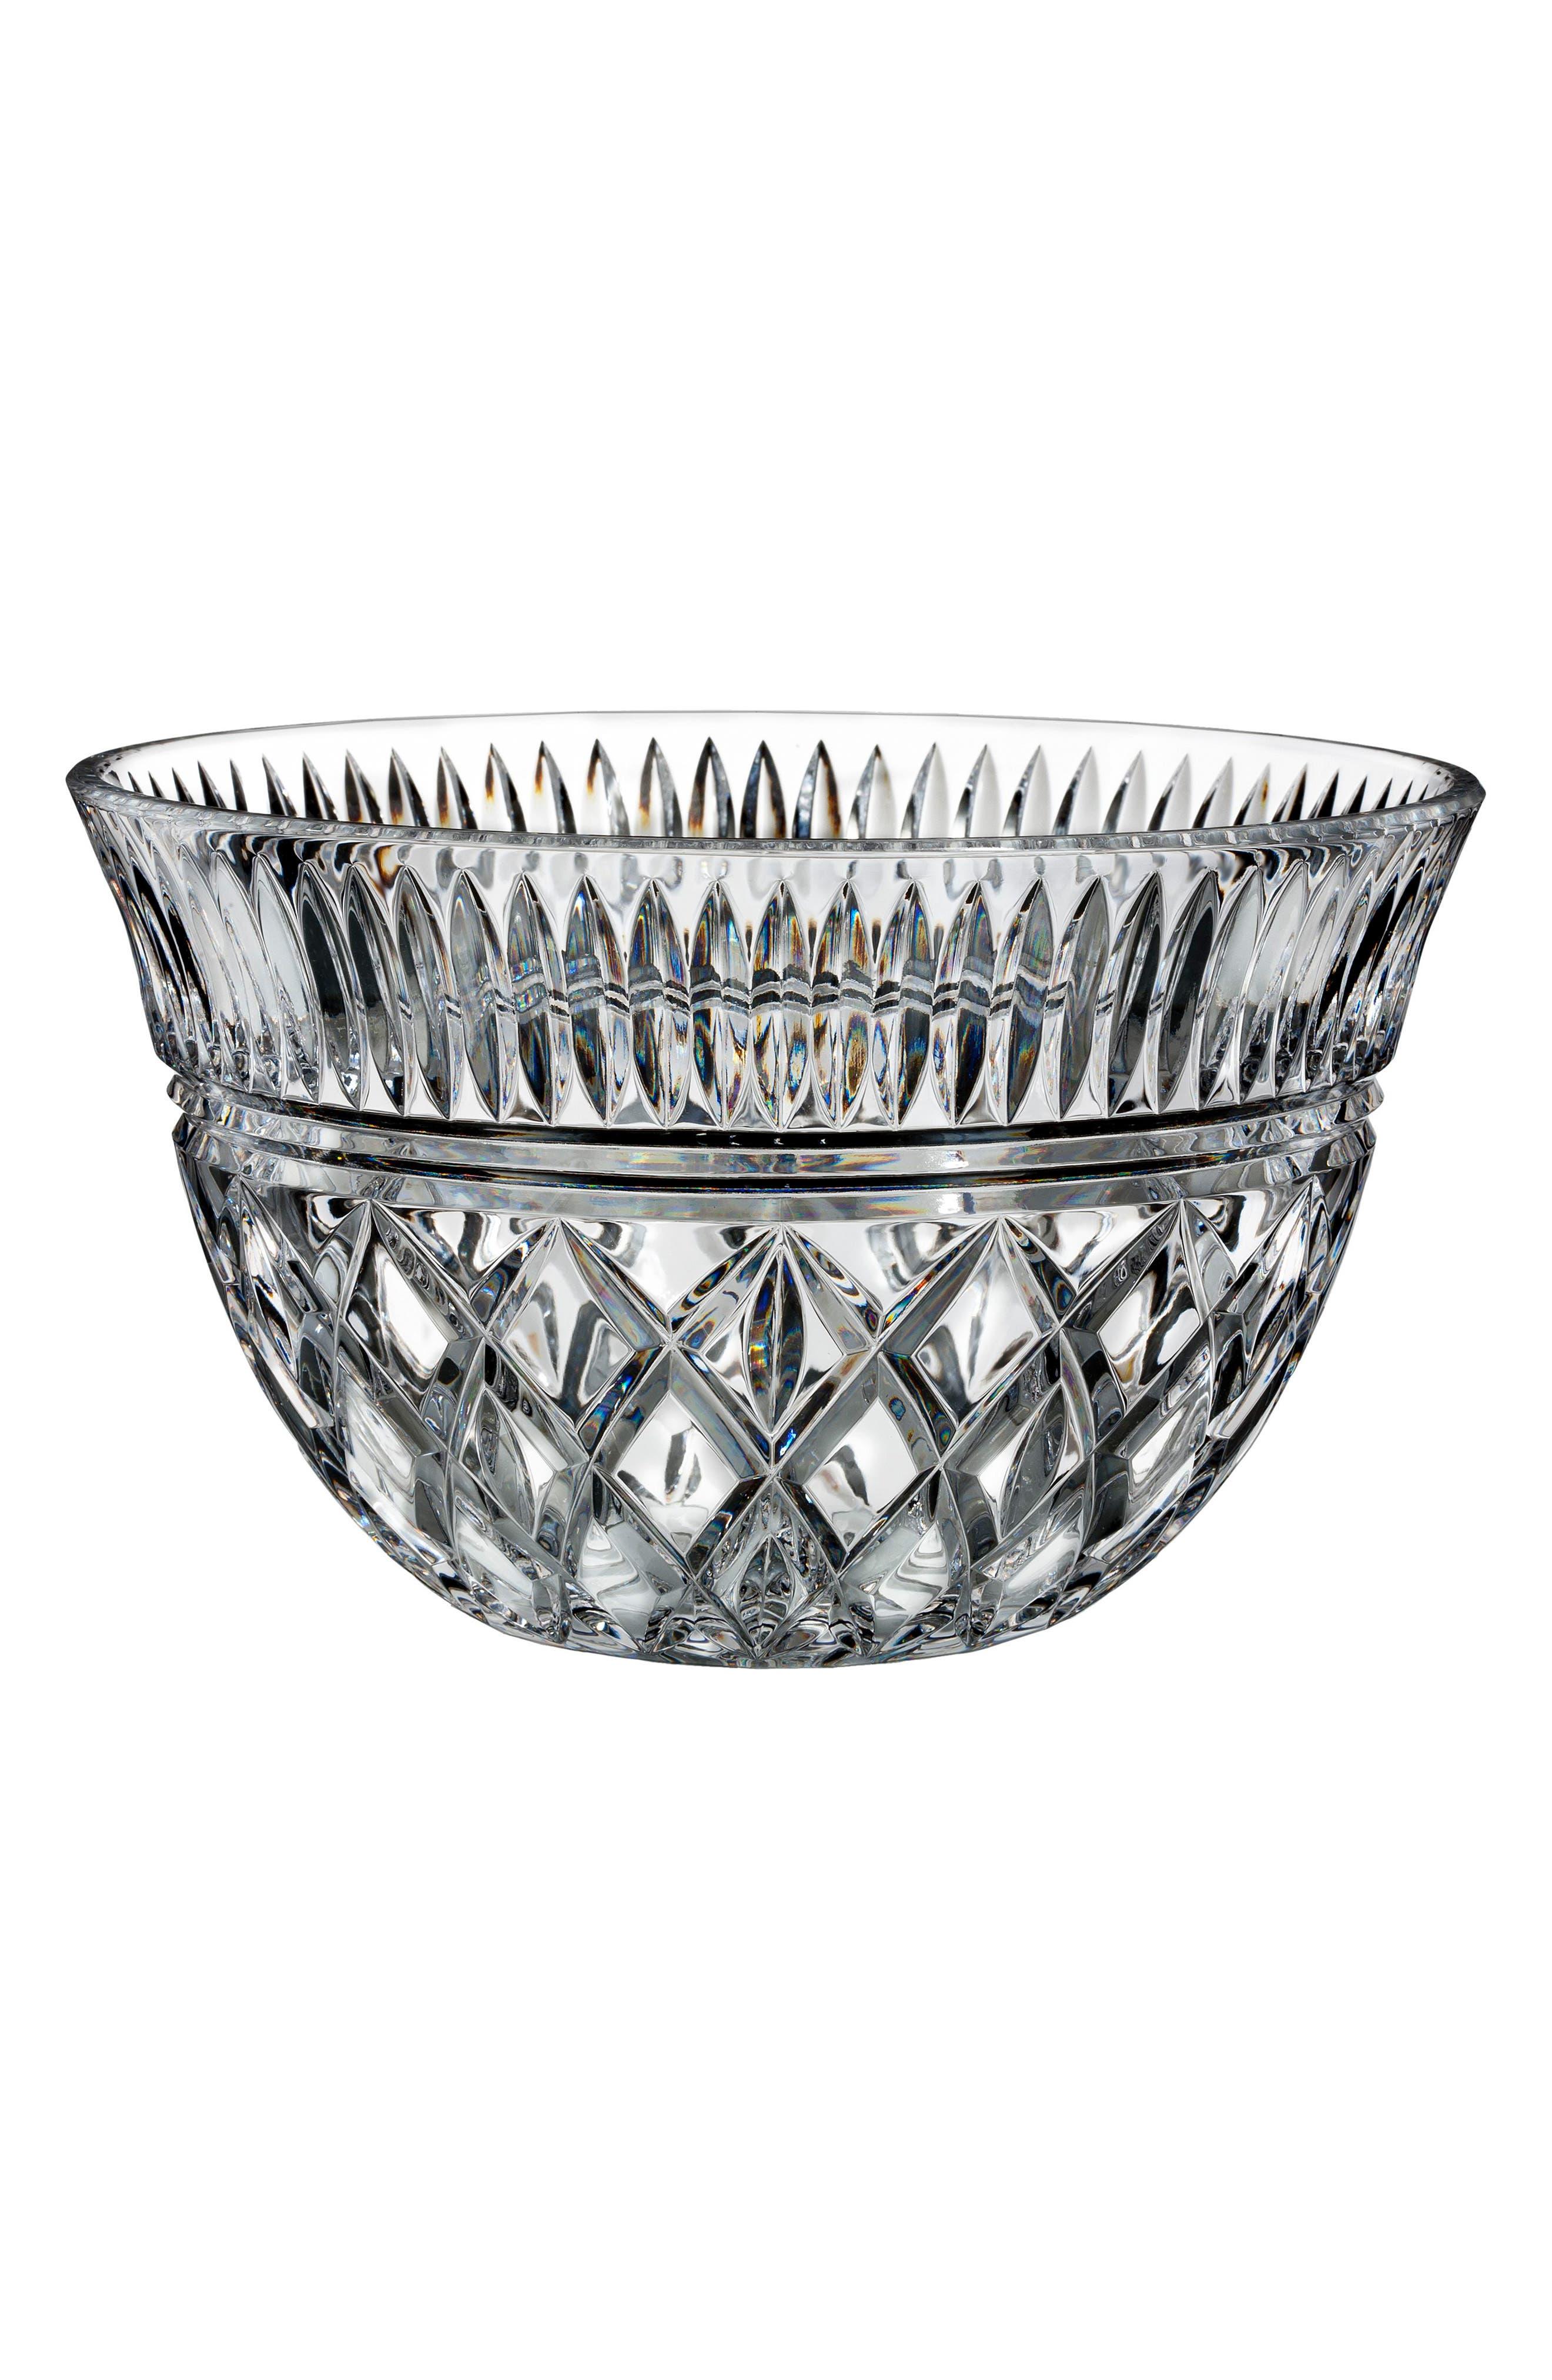 Eastbridge Lead Crystal Bowl,                             Main thumbnail 1, color,                             CLEAR